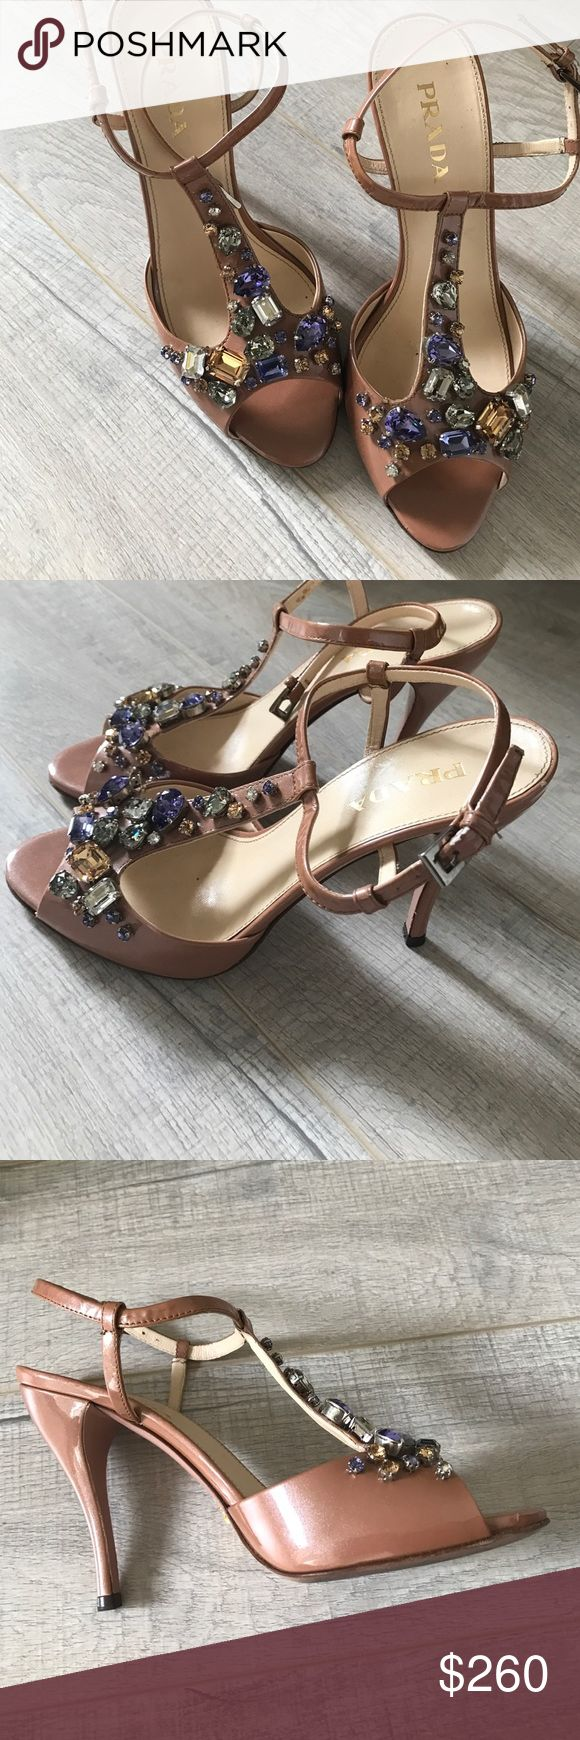 Prada high heels sandals with stones Prada beige high heels sandals Prada Shoes Heels